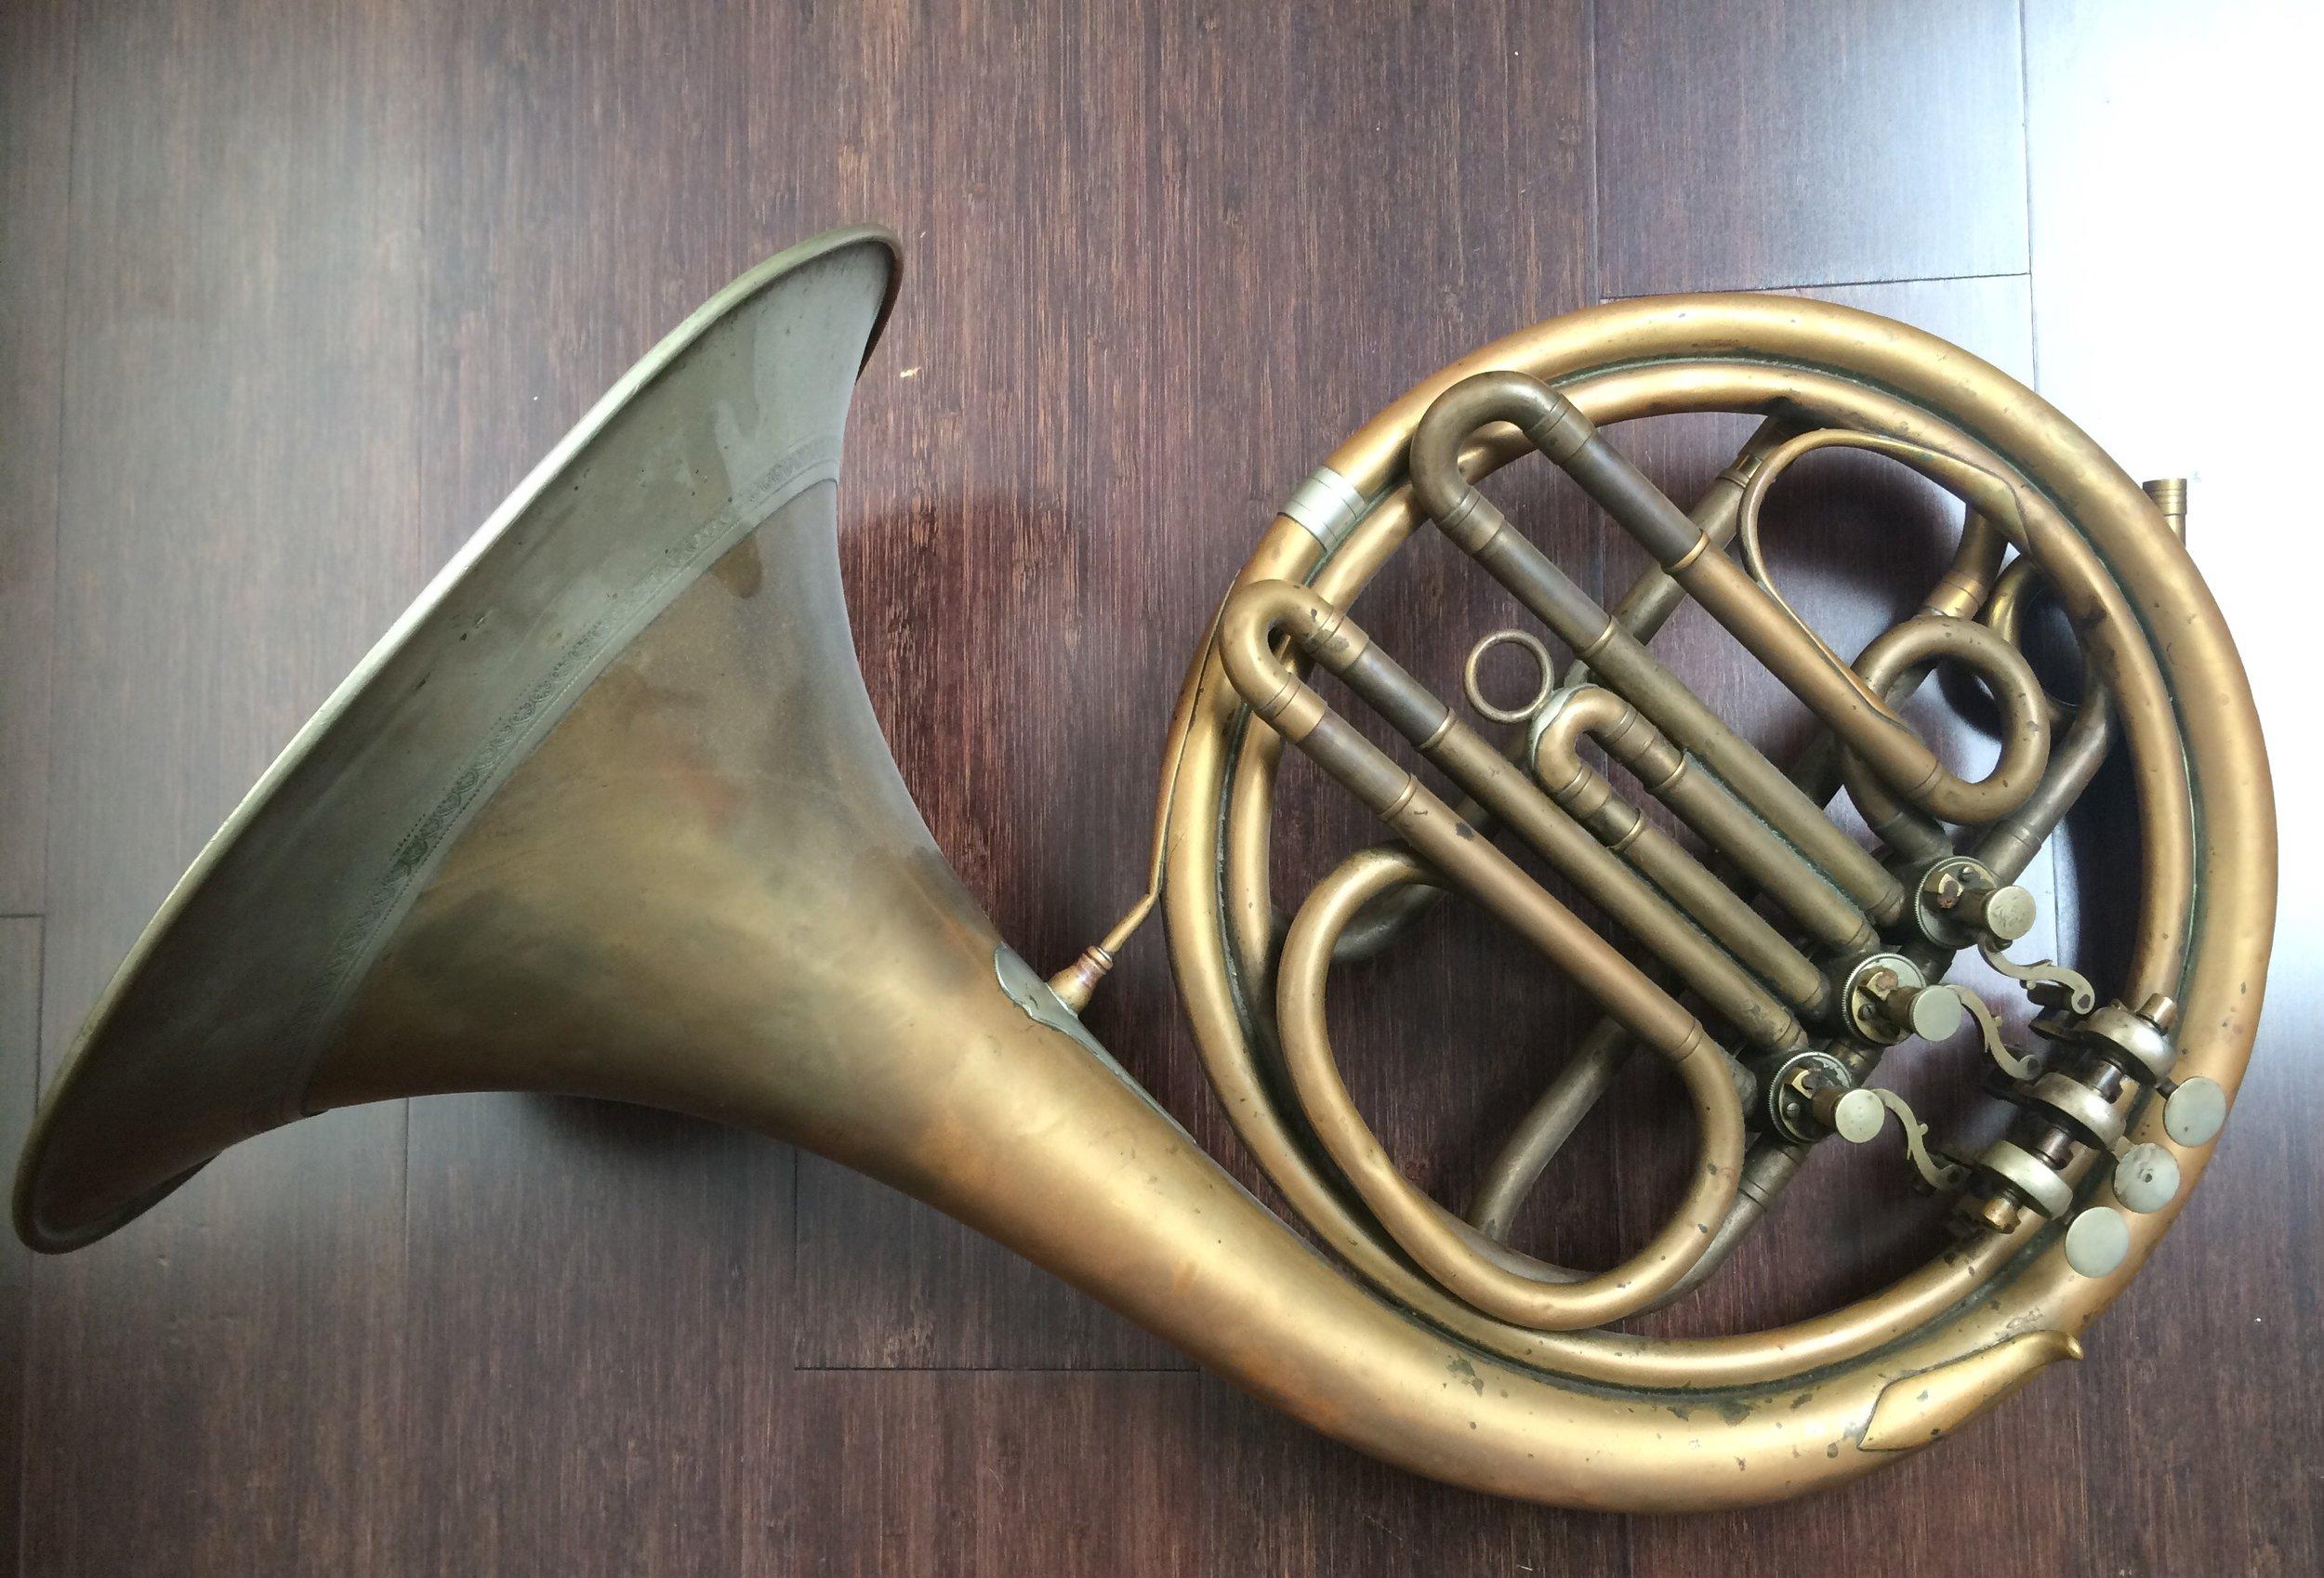 Rotary horn: Vladimír Kupka (Mariánské Hory,Moravia), early 20th century.